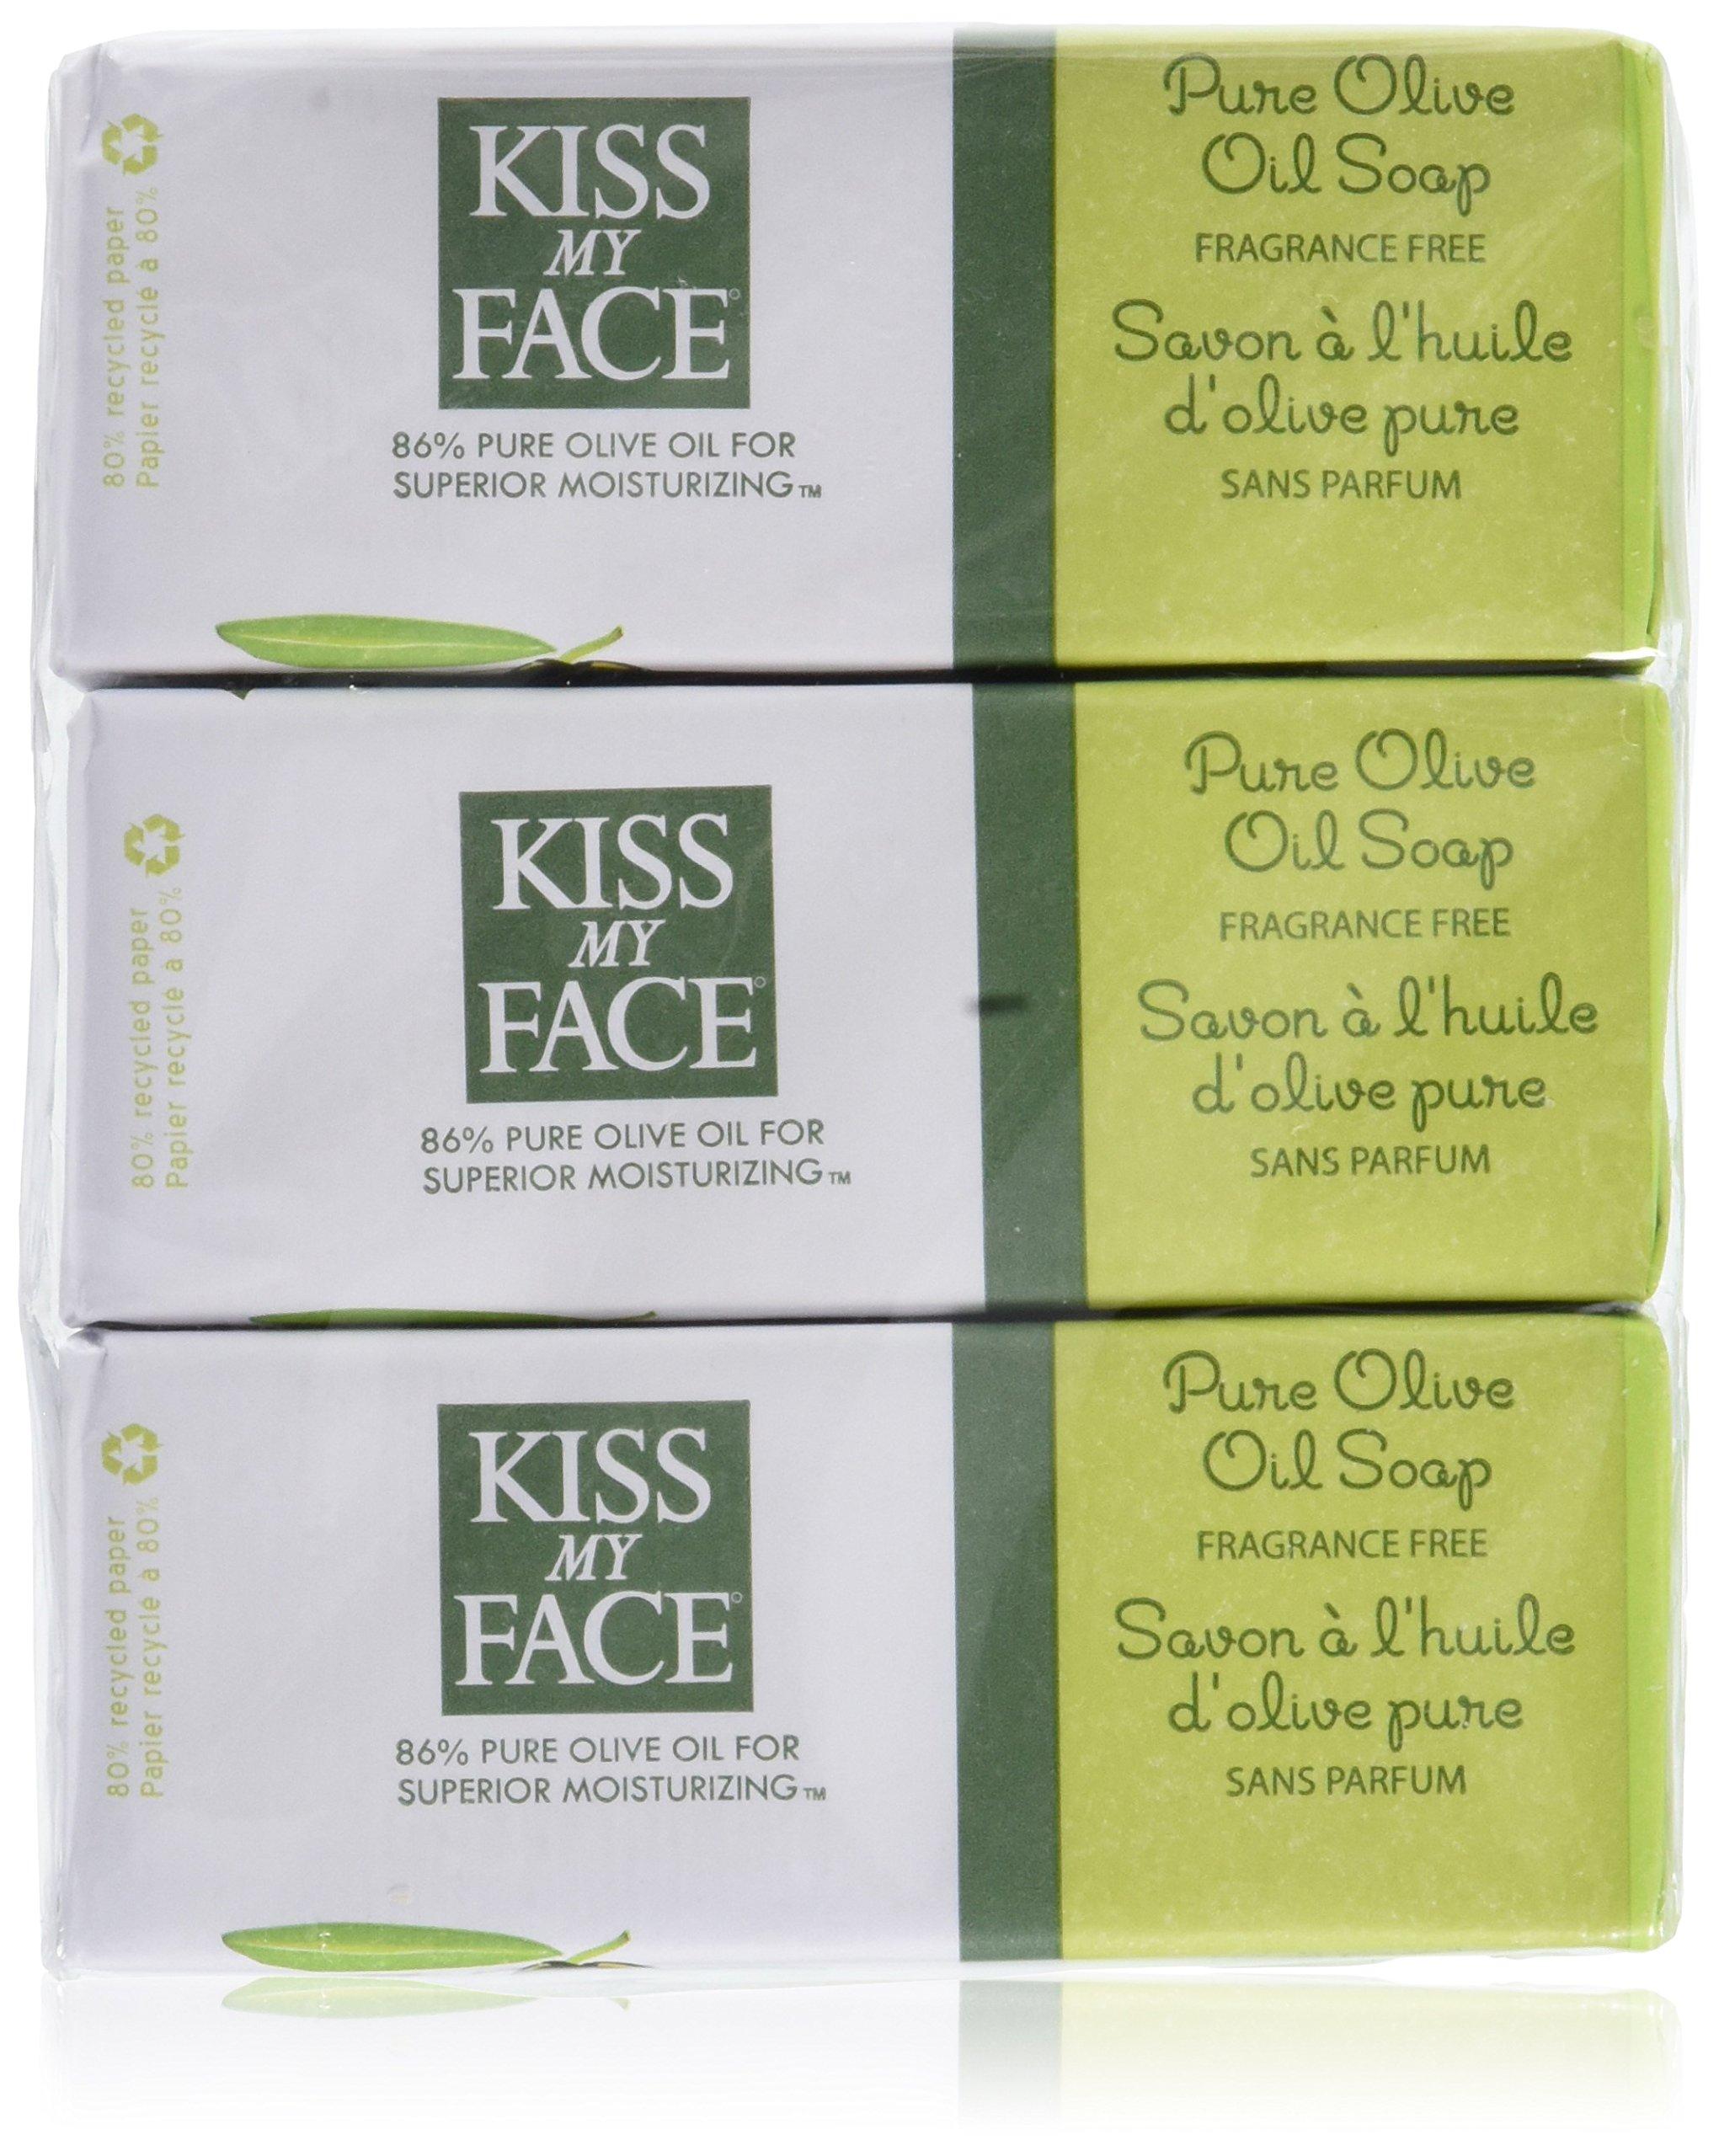 Pure Olive Oil Bar Soap Value Pack Fragrance Free - 3